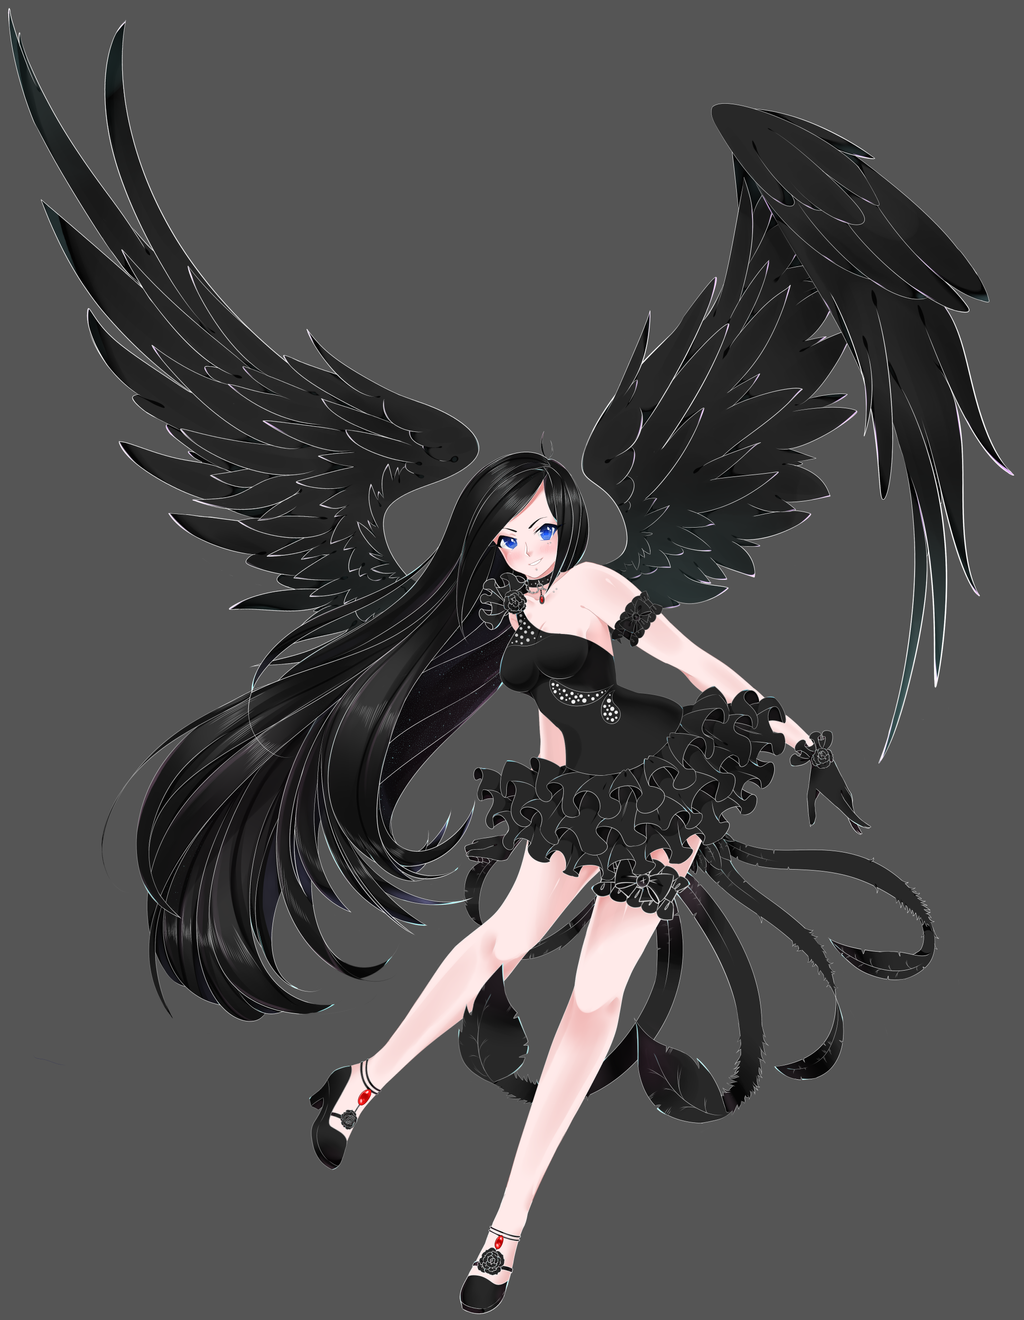 phoenix_noir_by_cocatrola-daq85tx.png